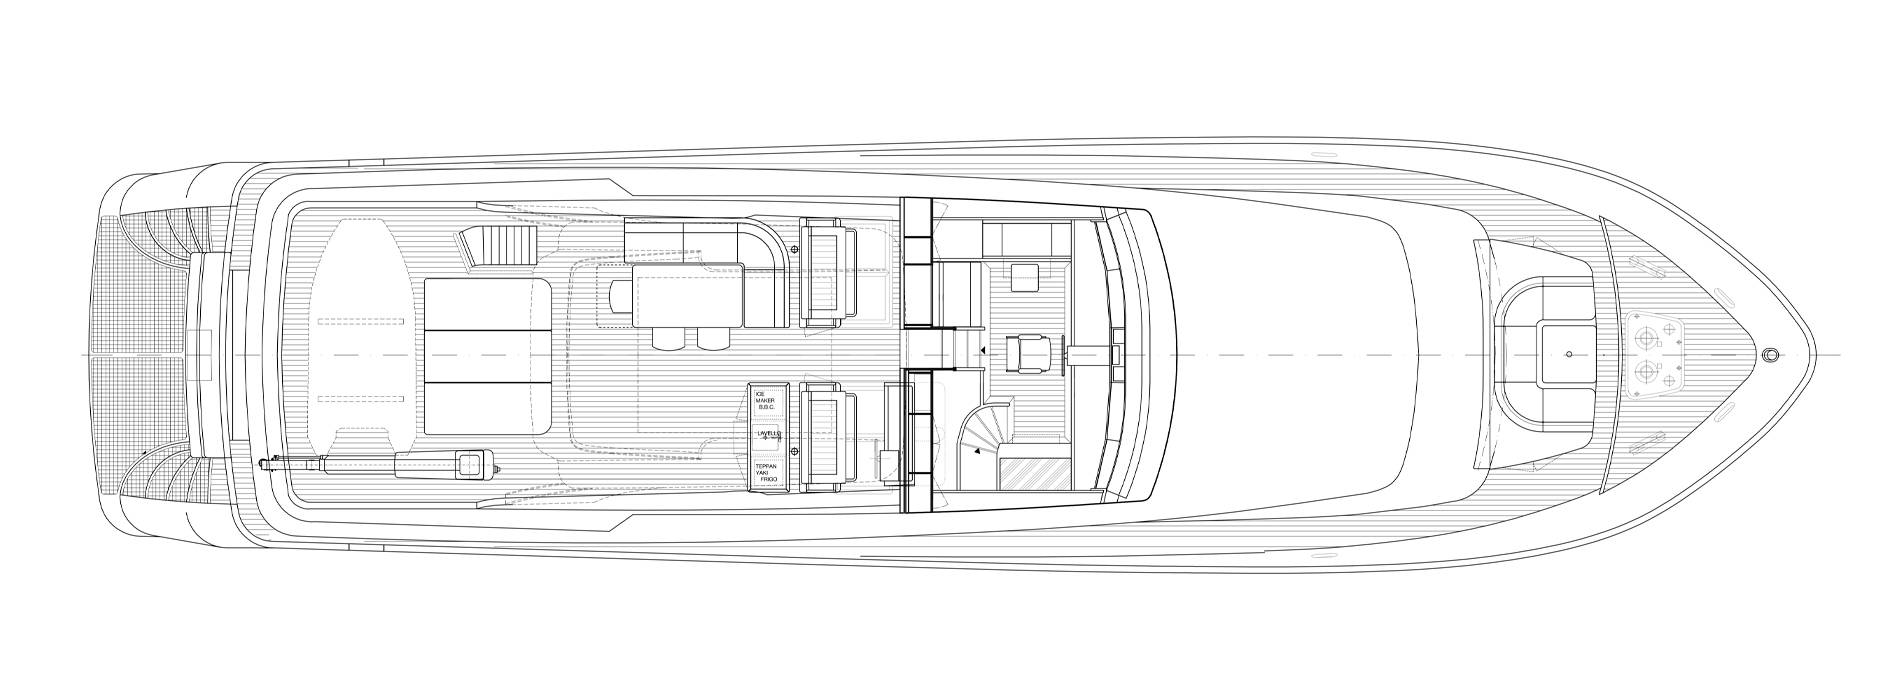 Sanlorenzo Yachts SL88-541 Flying bridge